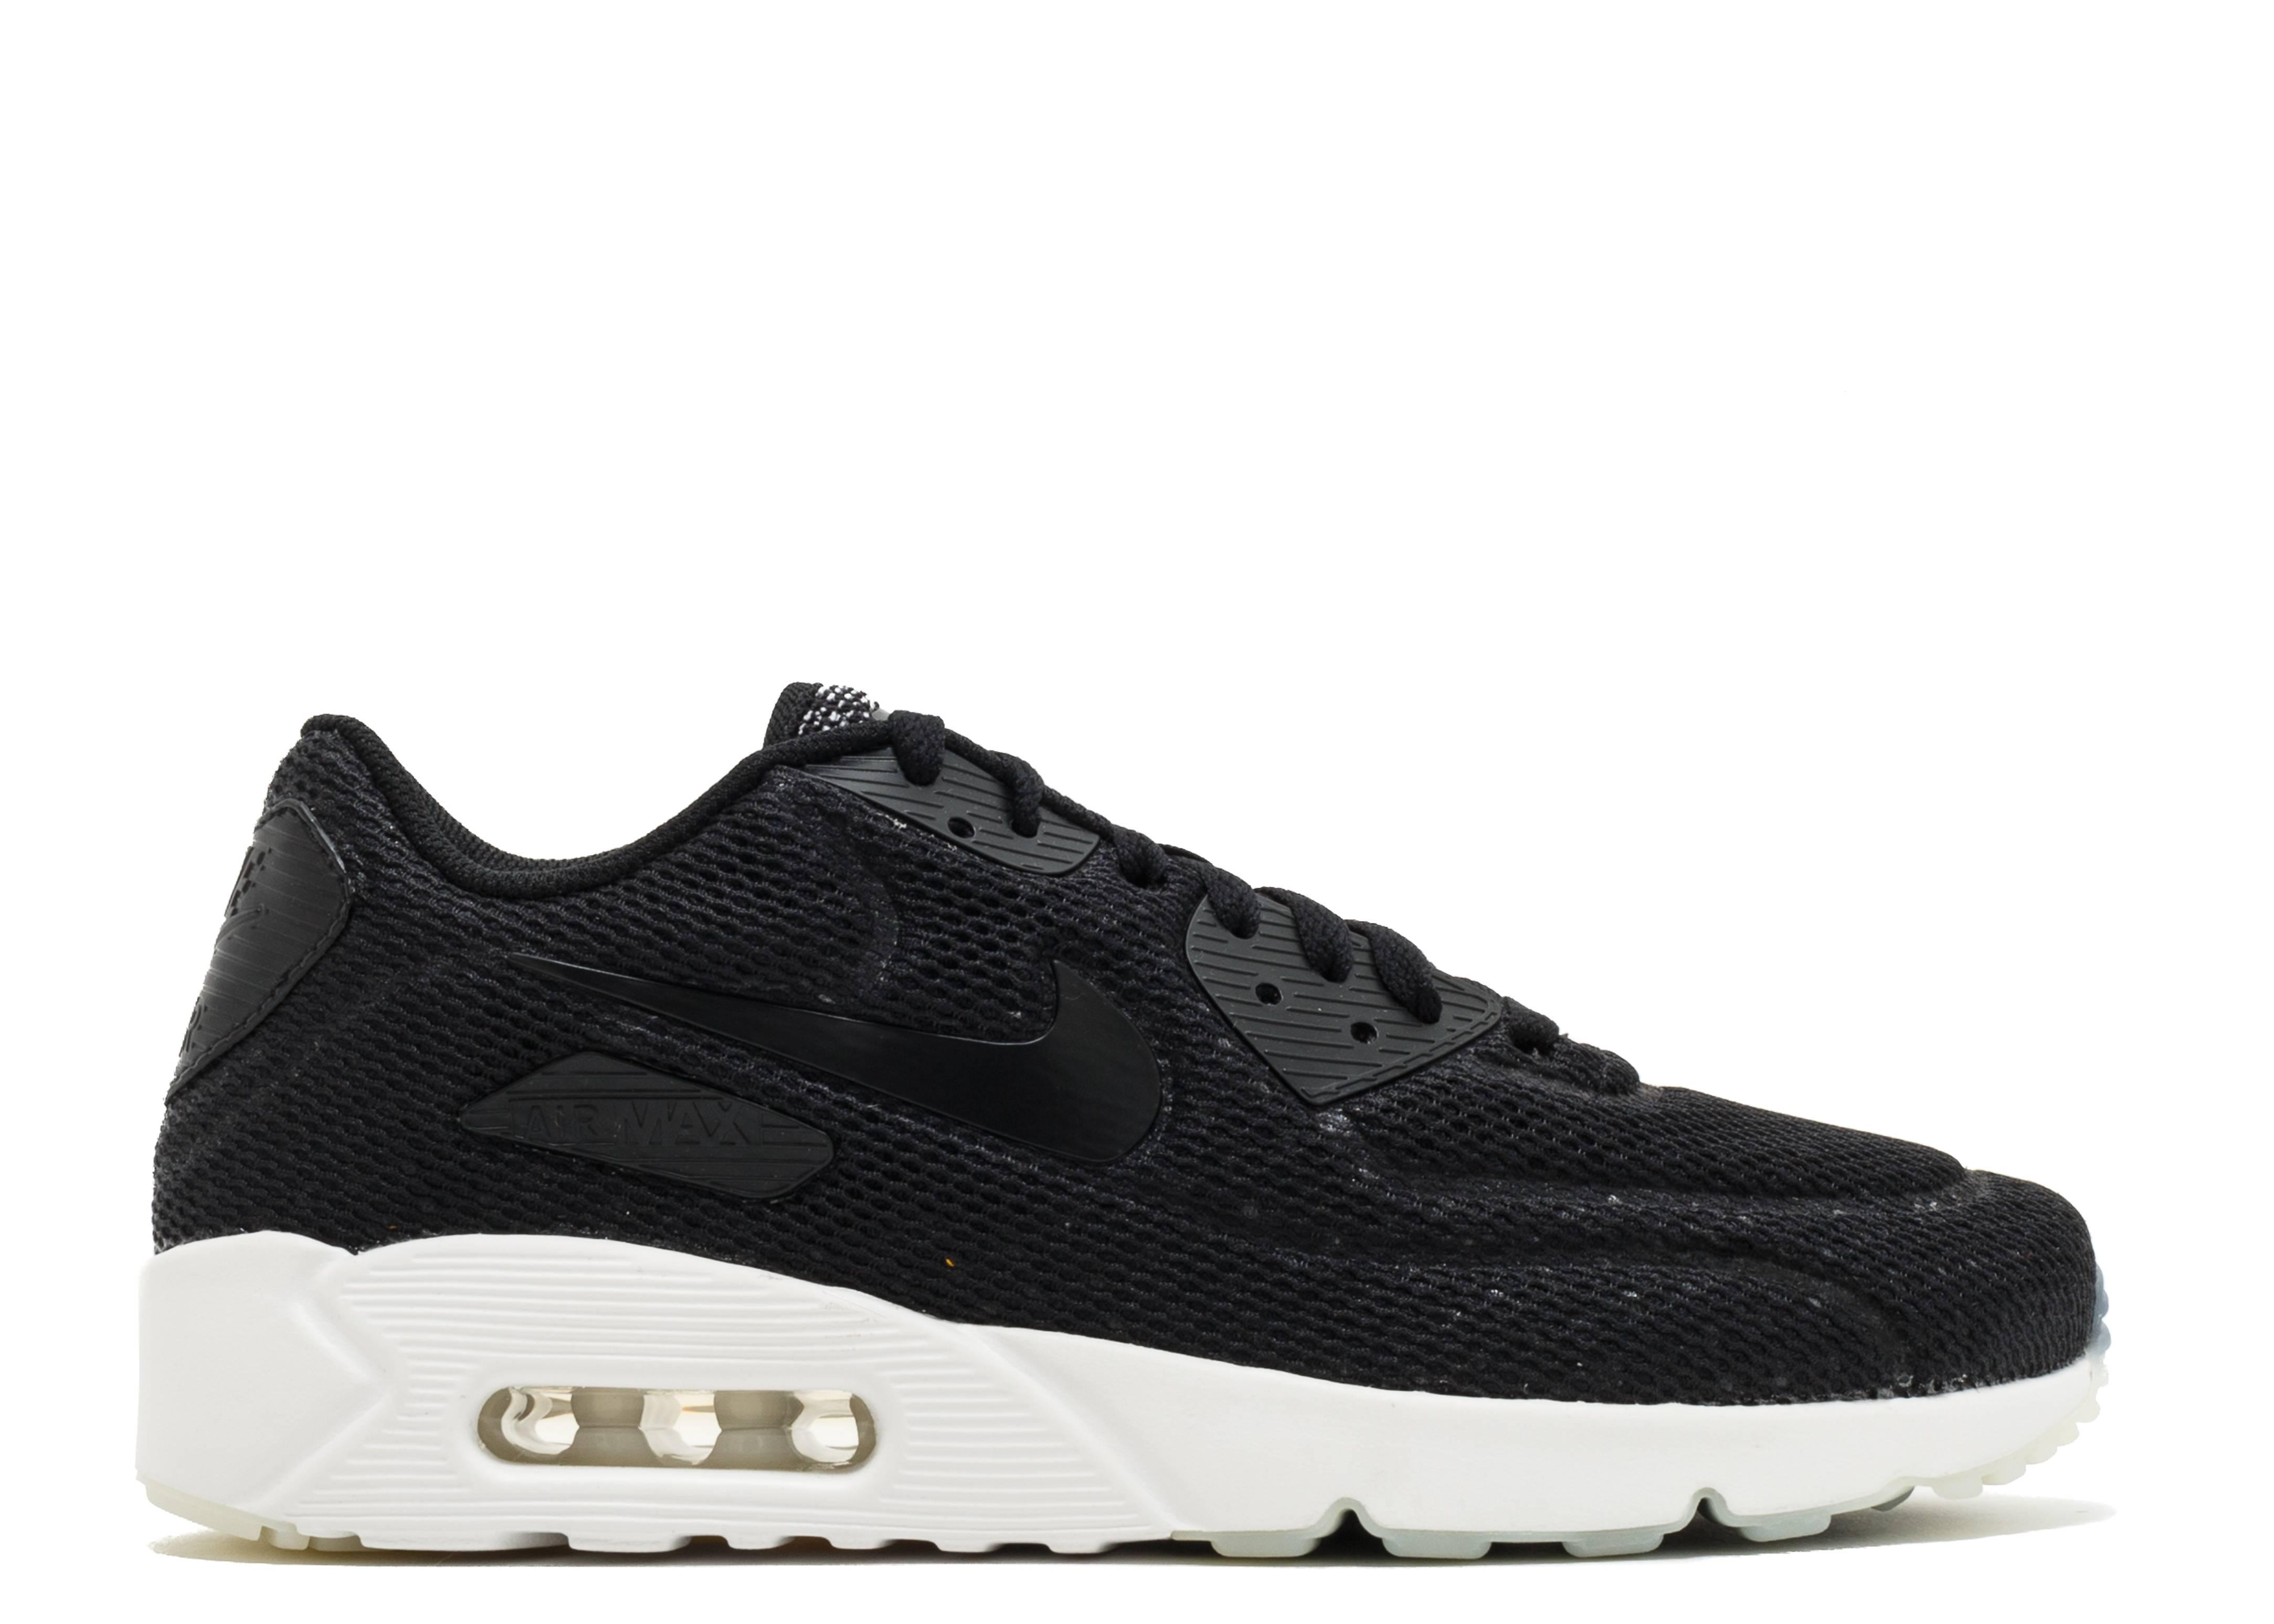 a4dc77683b5f Nike Air Max 90 - Men s   Women s Shoes